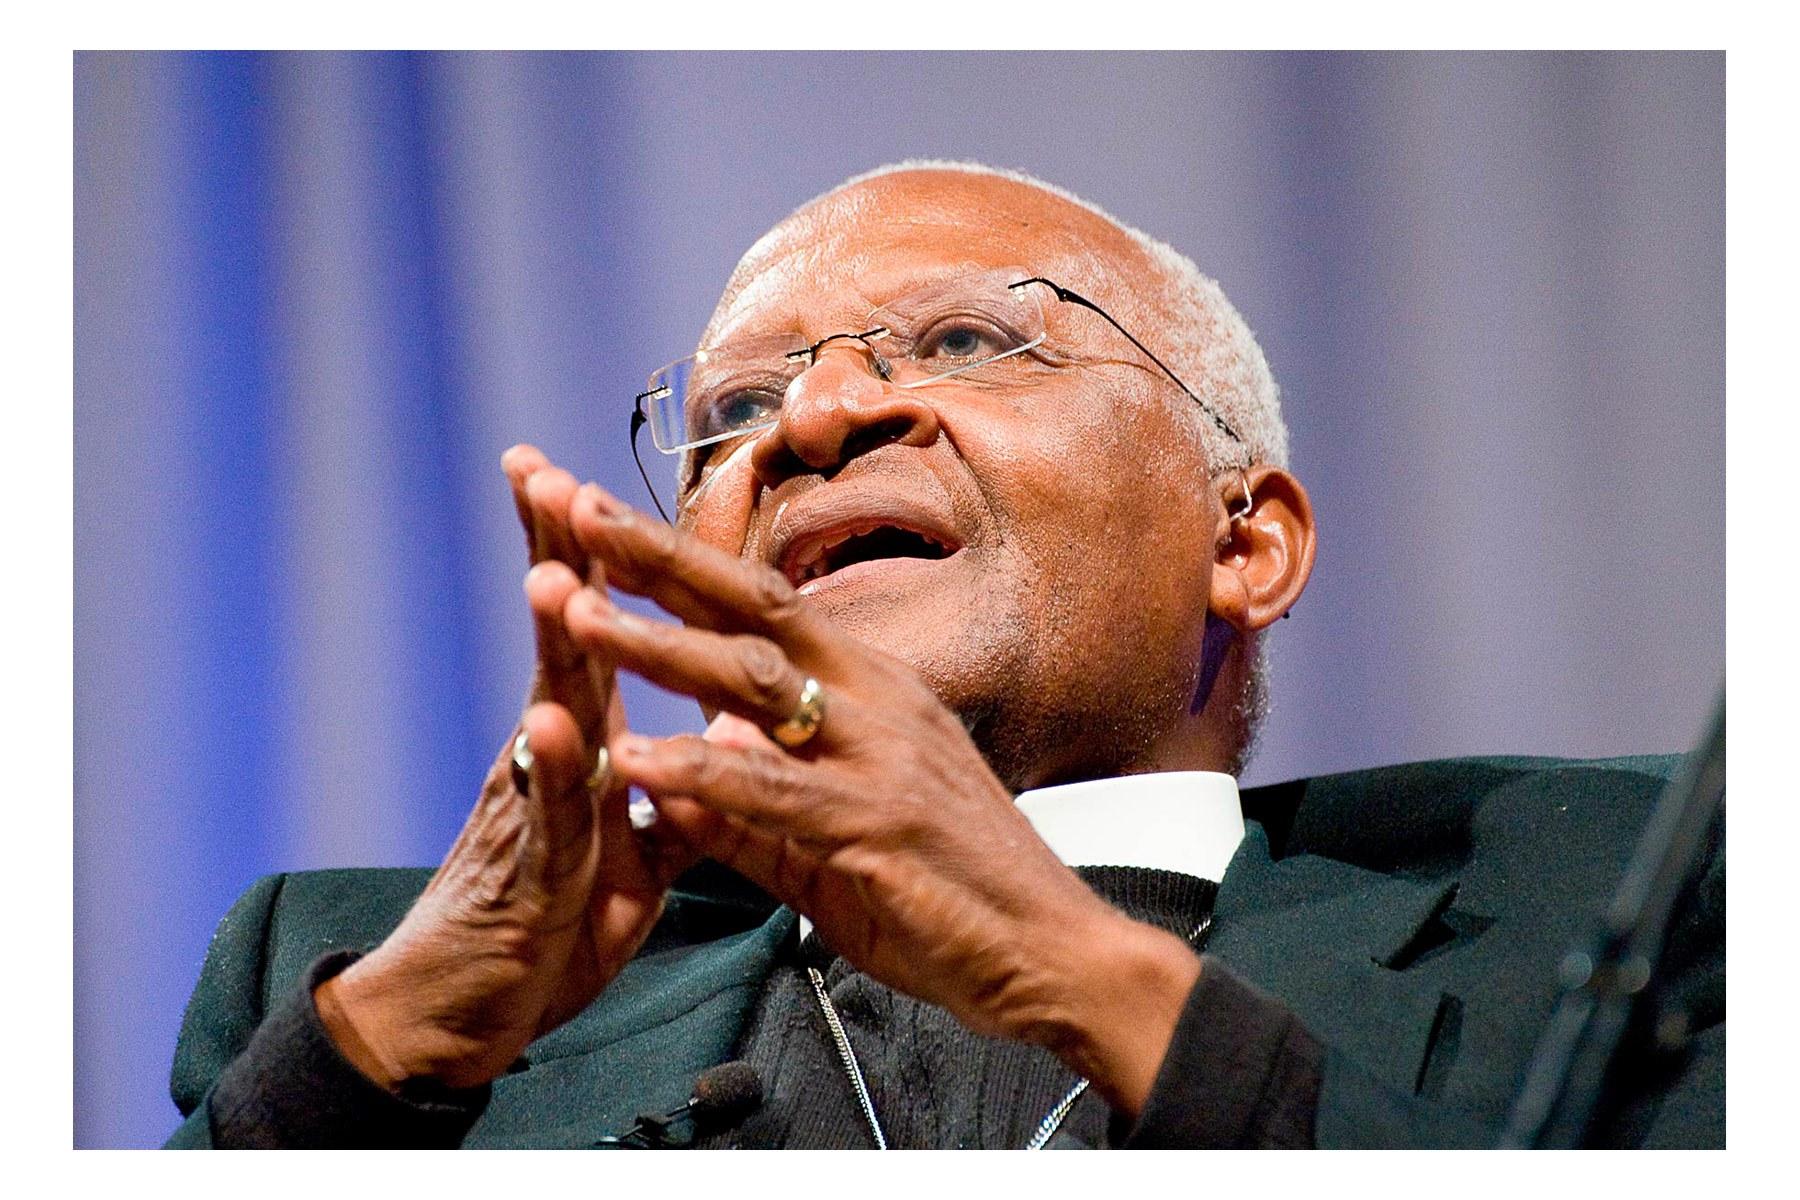 Archbishop Desmond Tutu, University of Portland, 05-05-2009